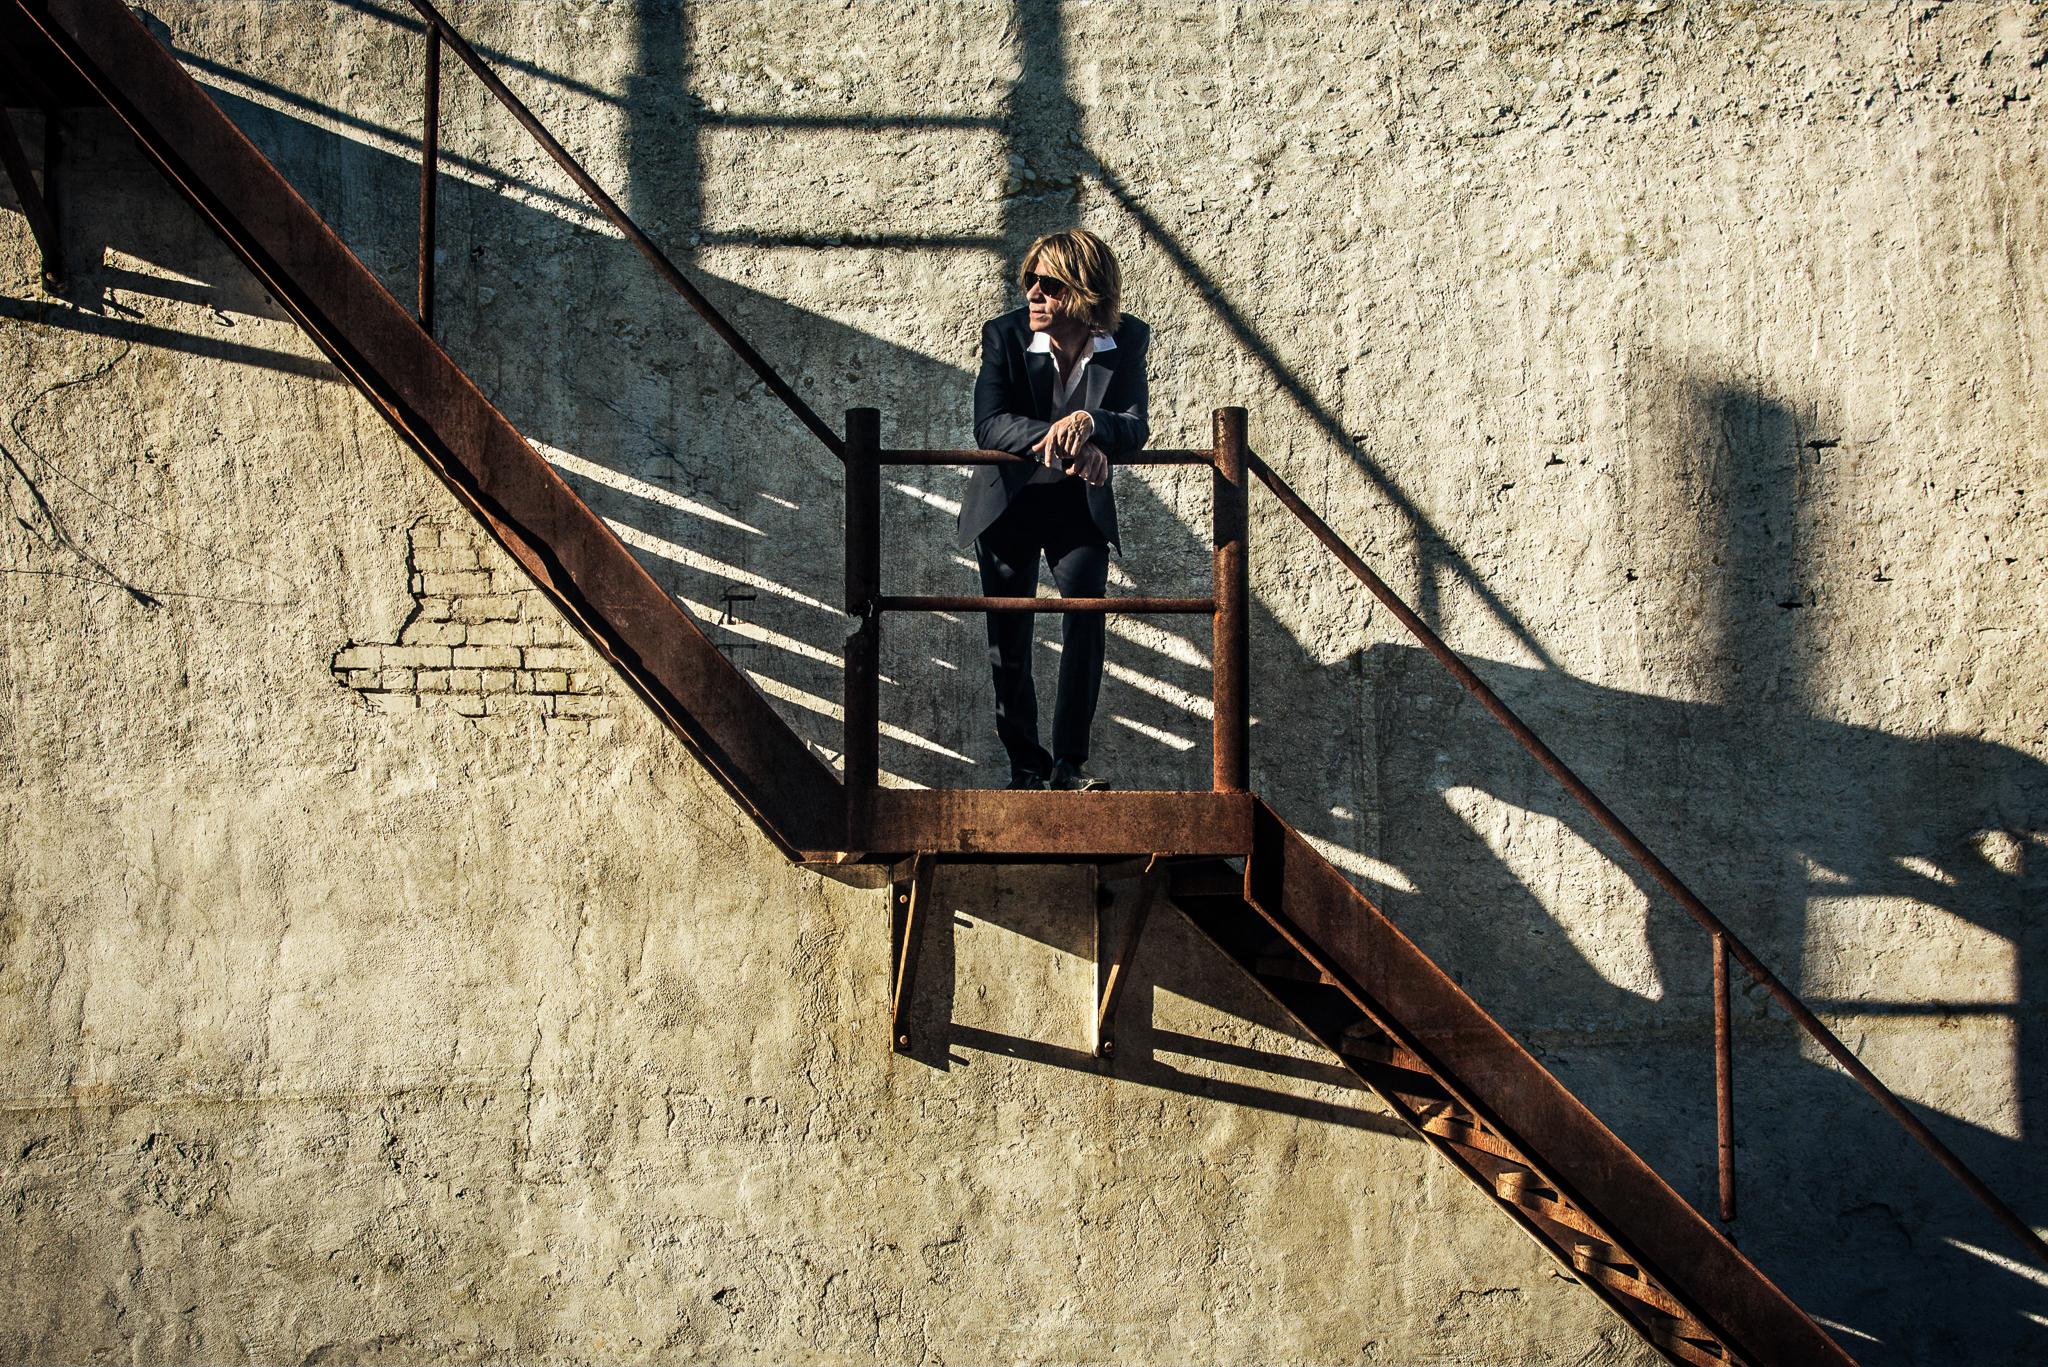 Robert-Harrison_Stairs_Final_Web_72dpi_Valerie-Fremin-Photography